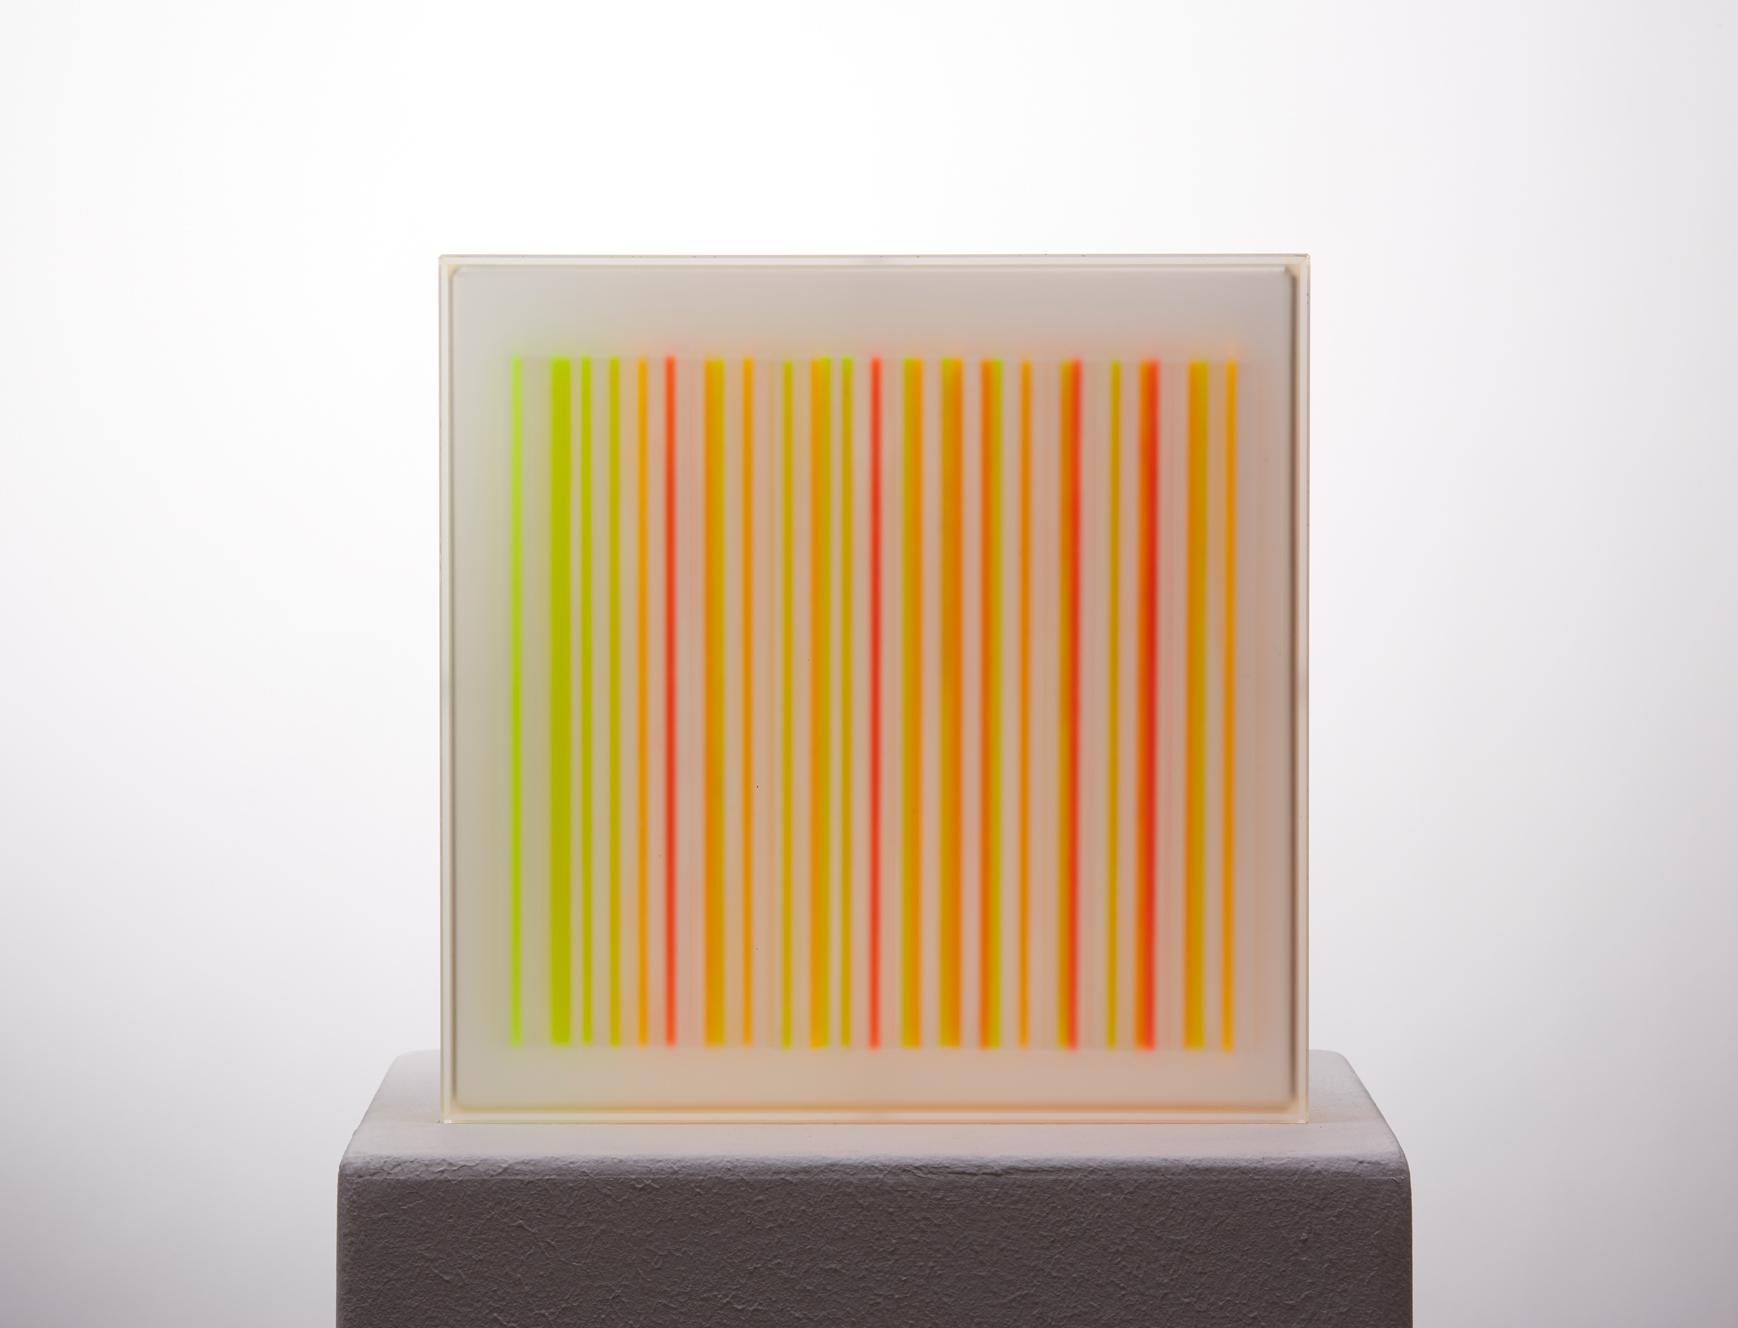 Tamar Klar, Light connection I, 2016